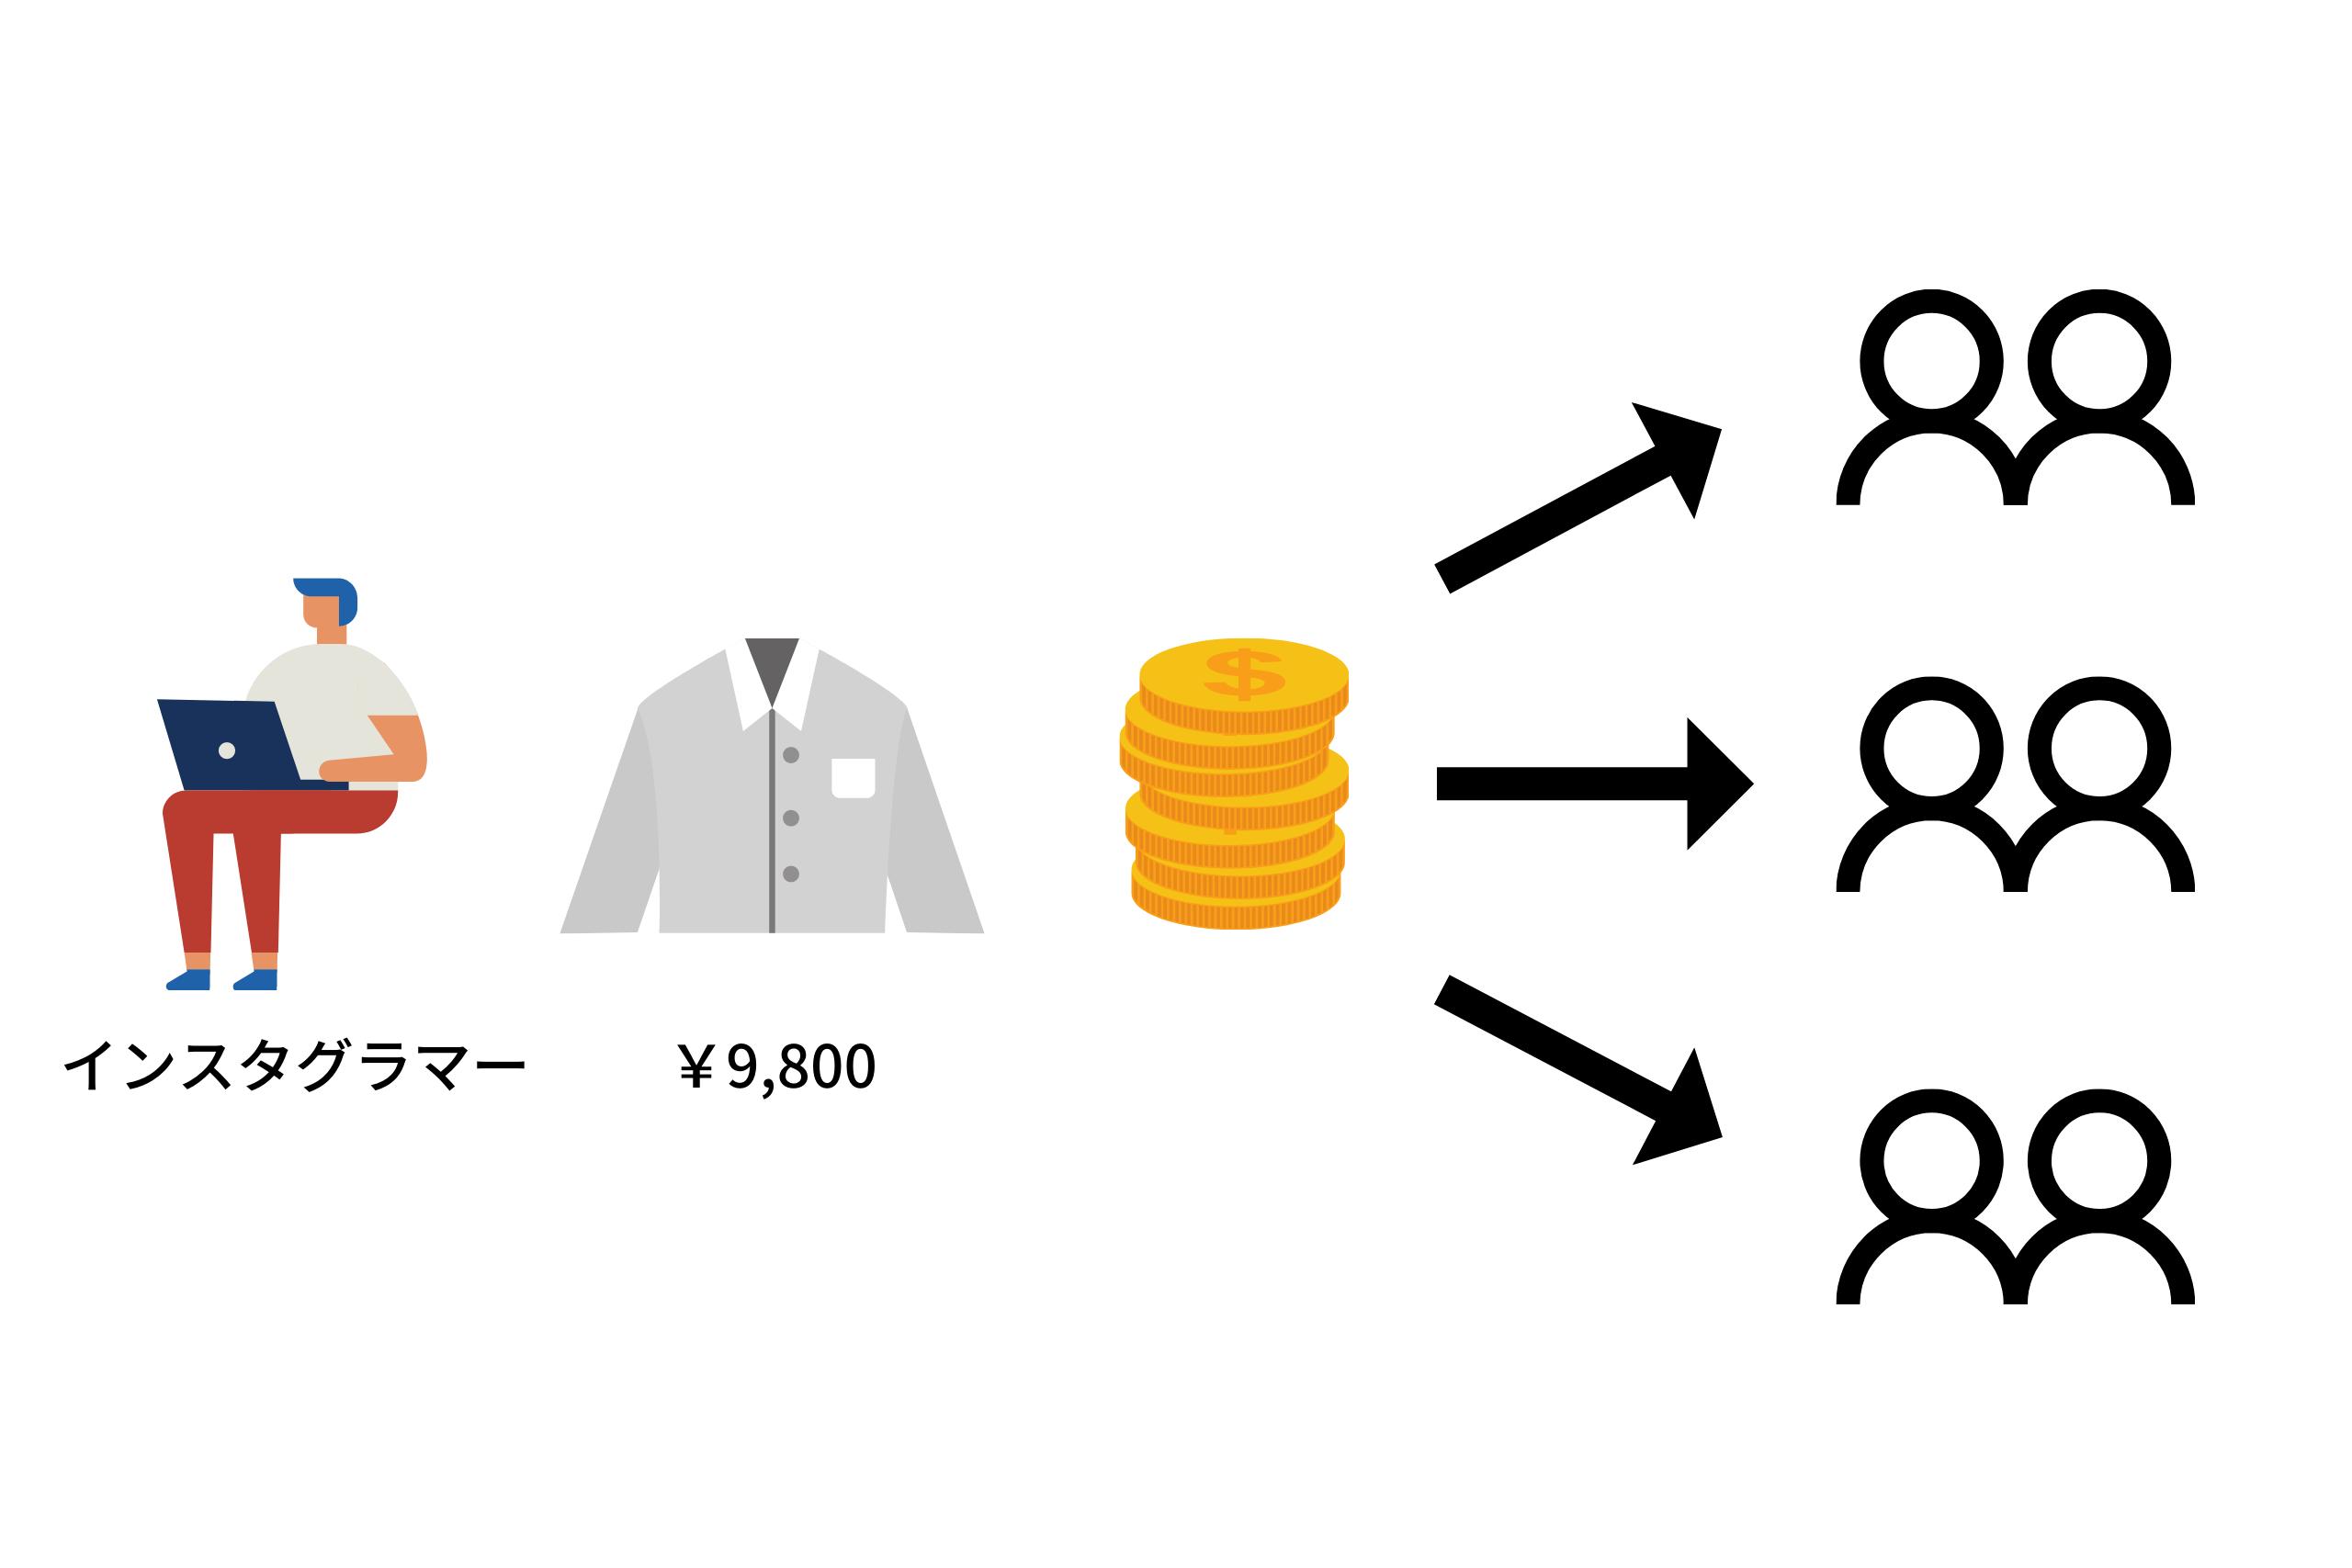 Product sales illustration